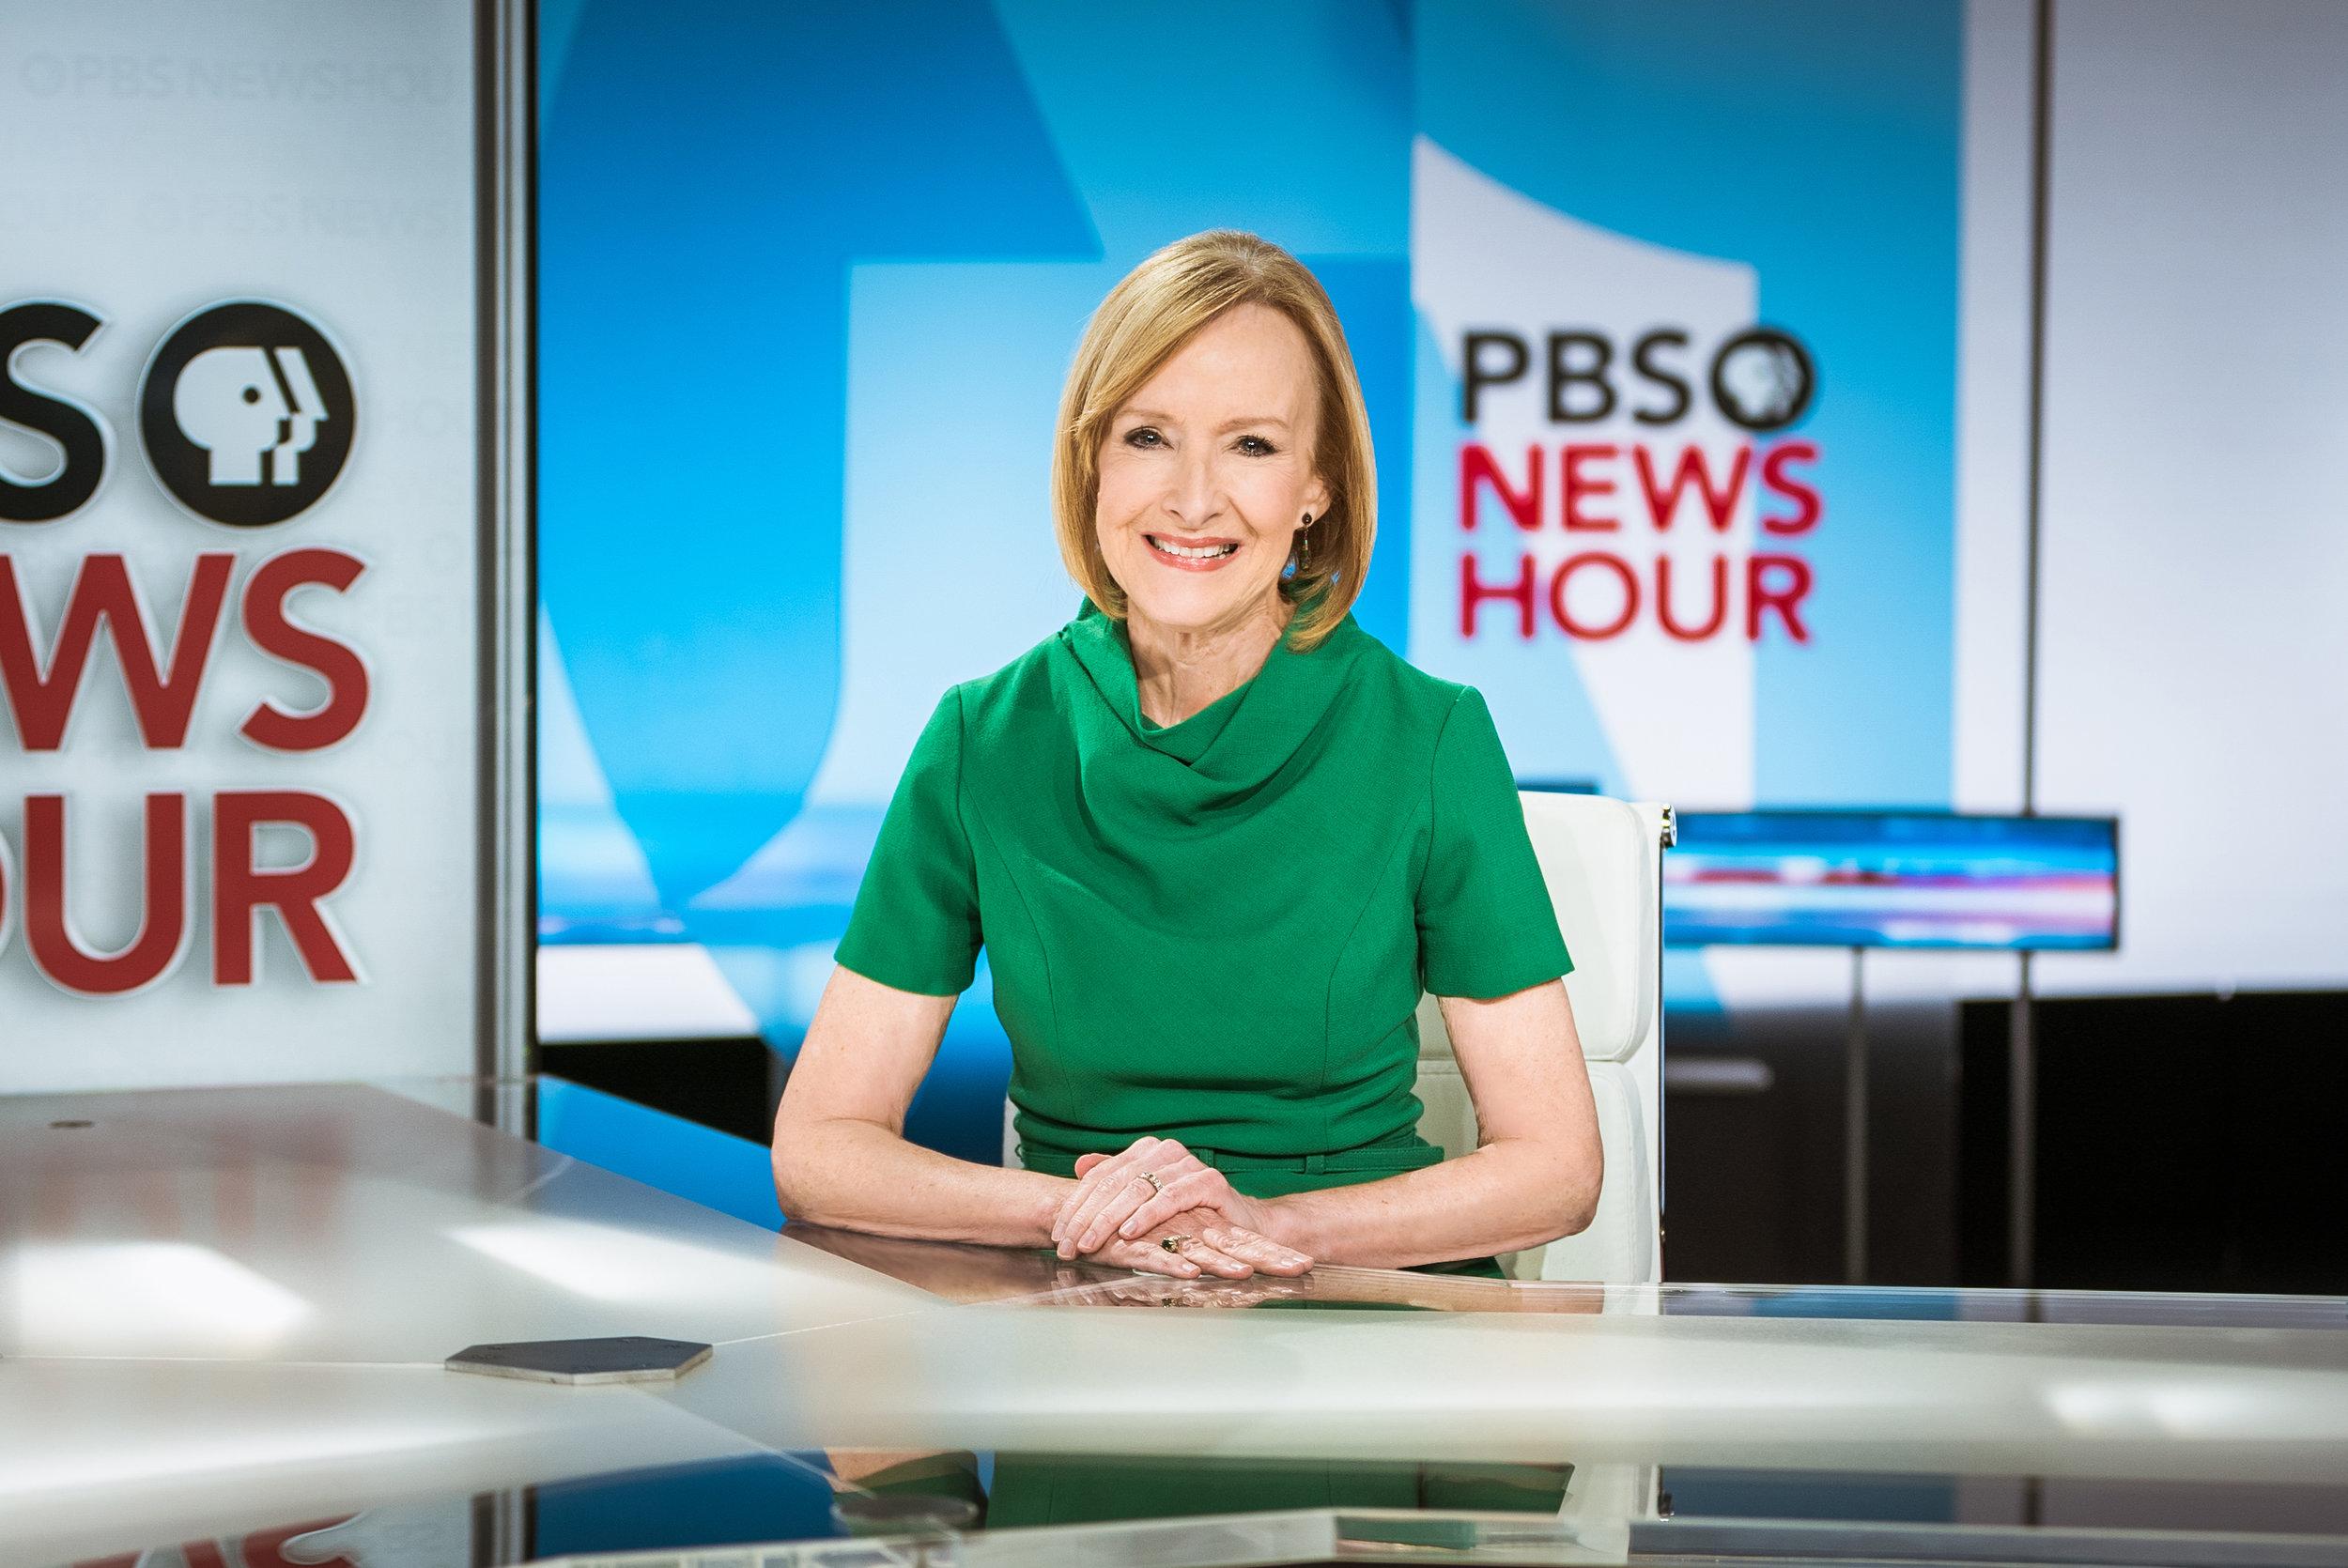 3.18_PBSNewsHour_JudyWoodruff (1).jpg